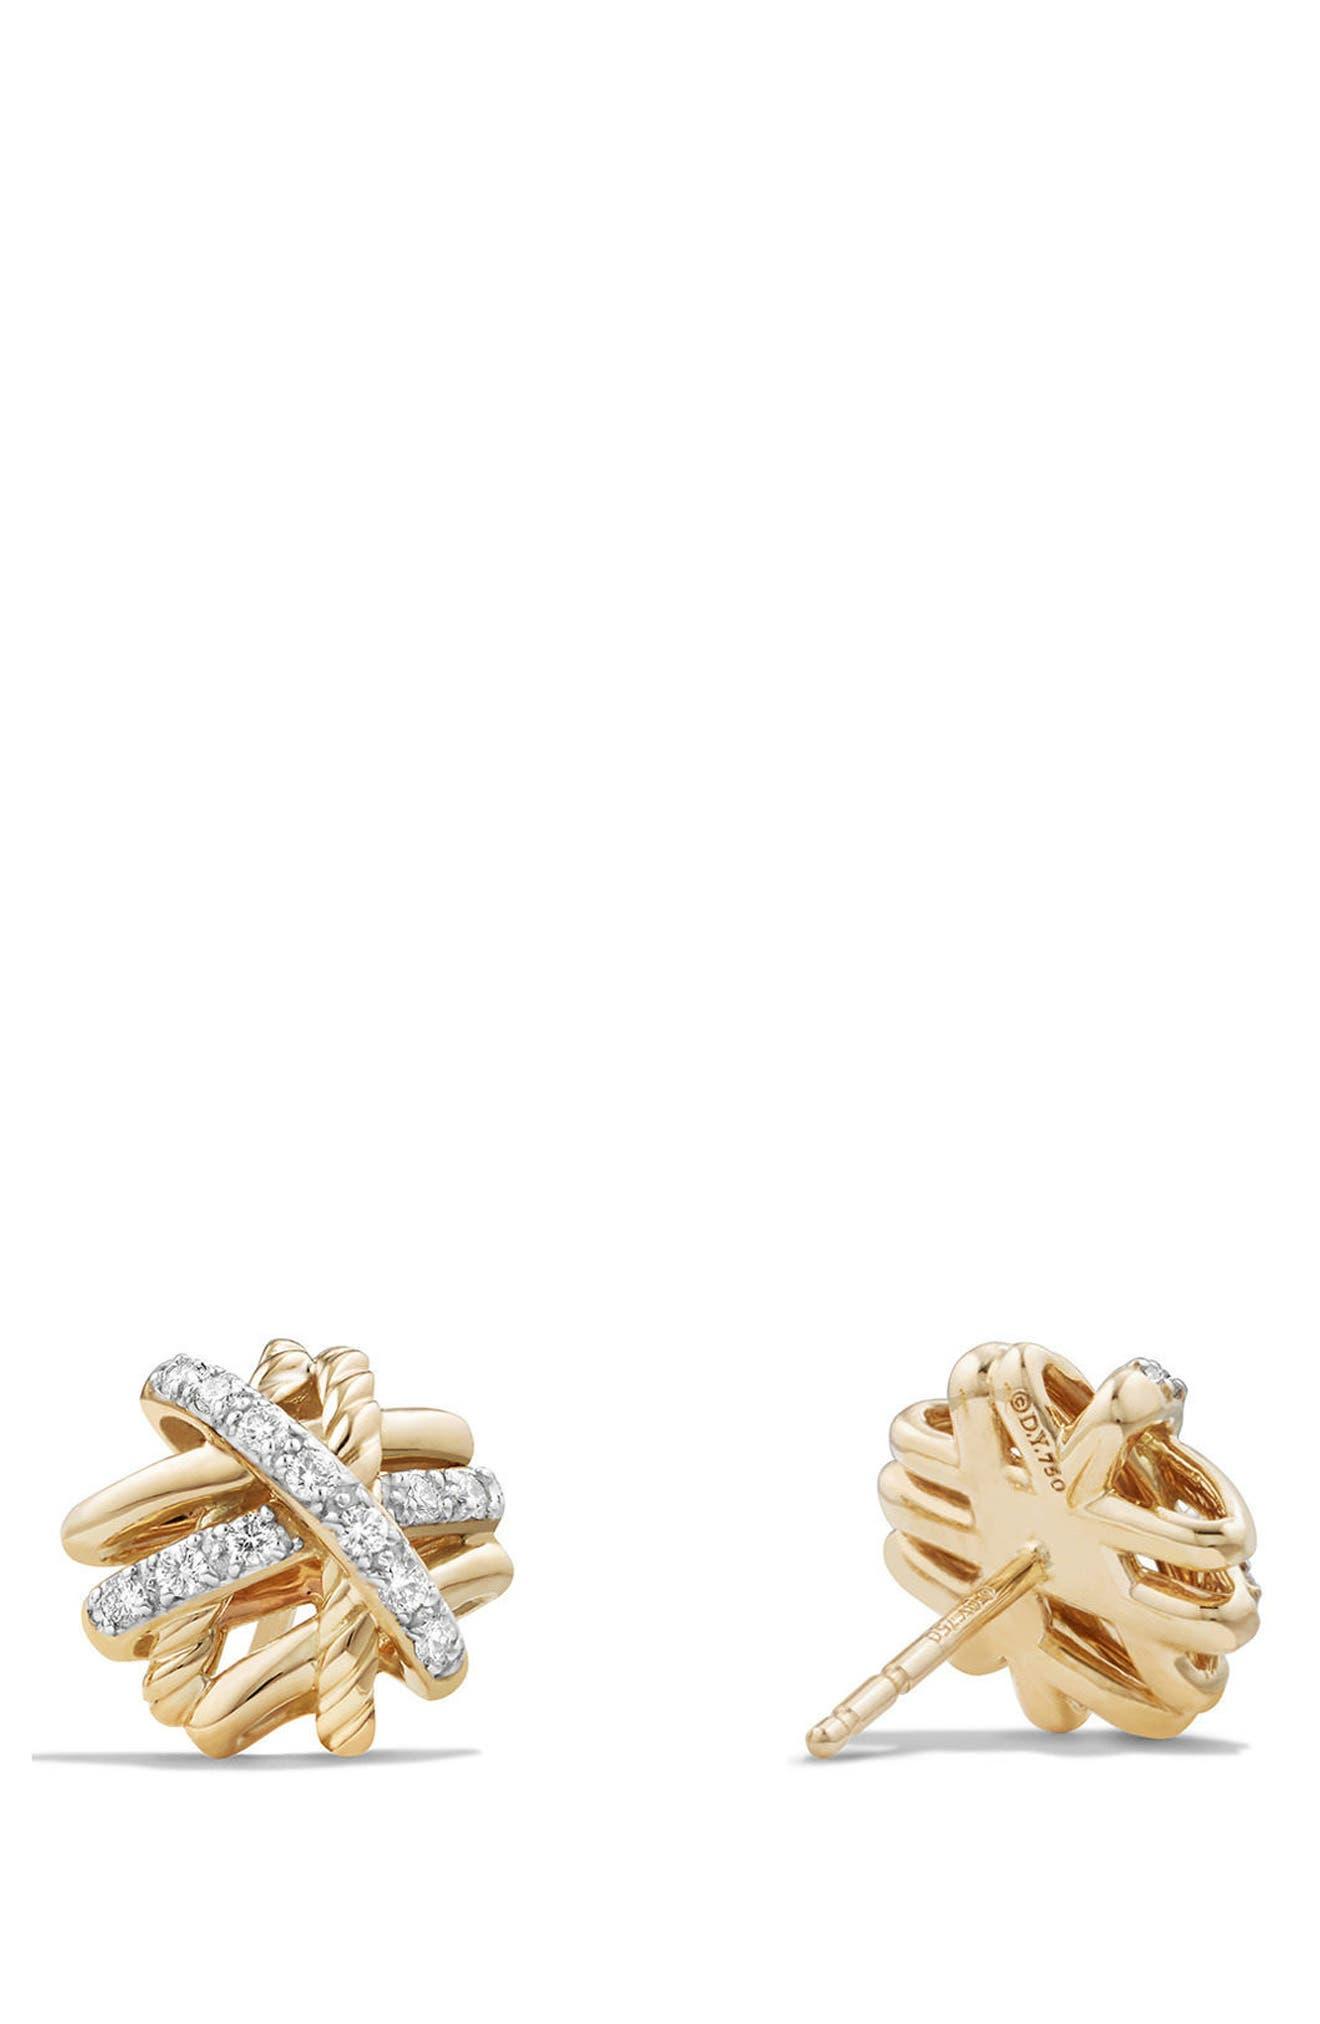 DAVID YURMAN, Crossover Stud Earrings with Diamonds in 18k Gold, Alternate thumbnail 2, color, YELLOW GOLD/ DIAMOND